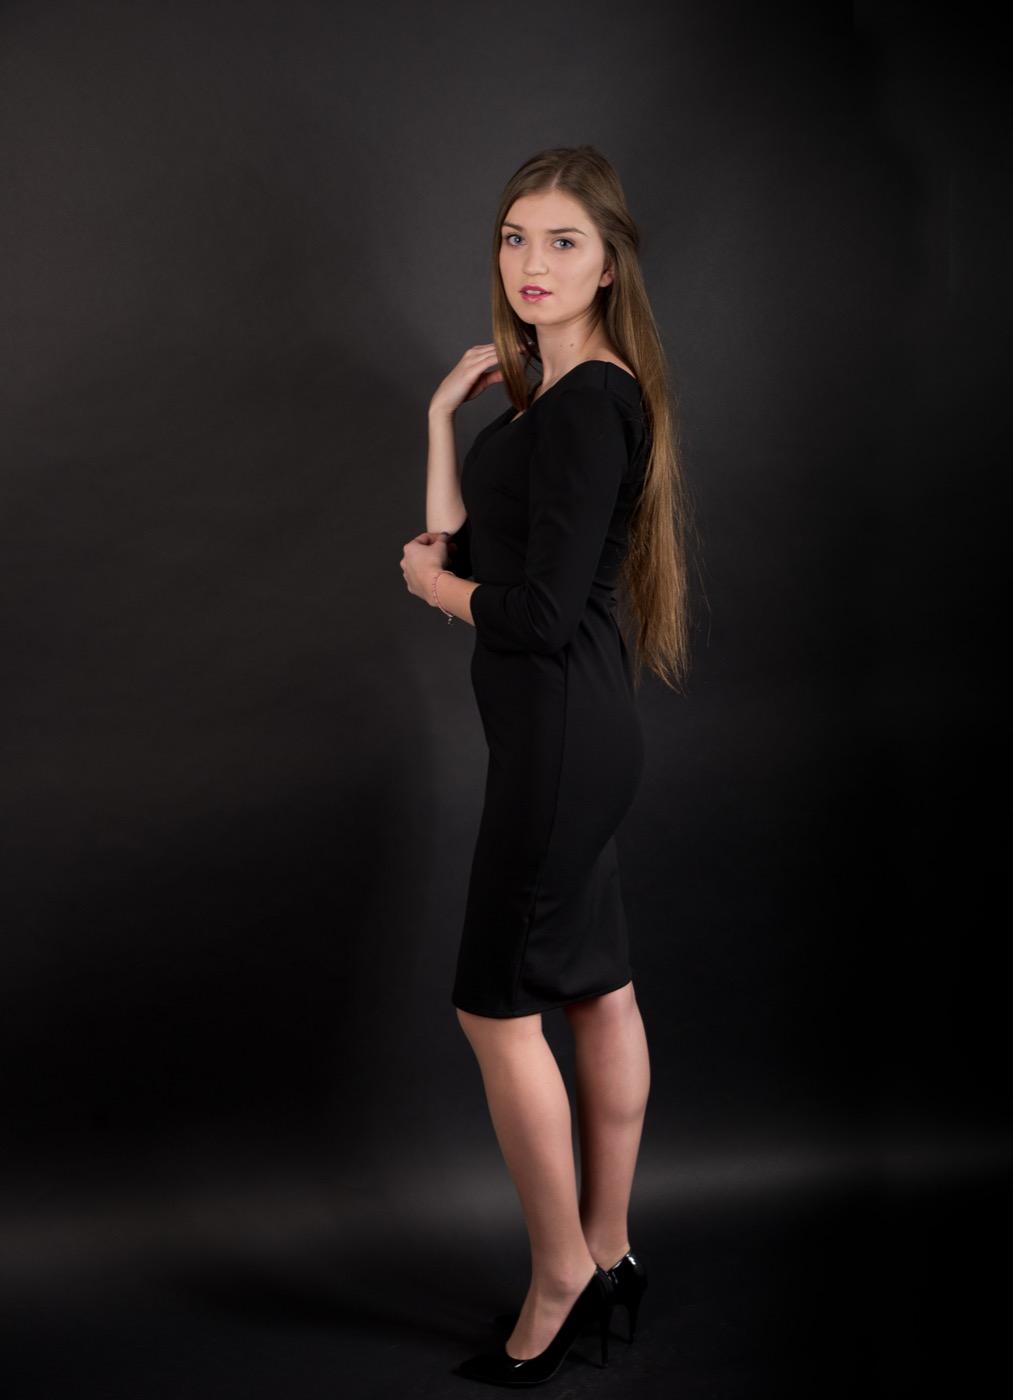 julia_sesja-3